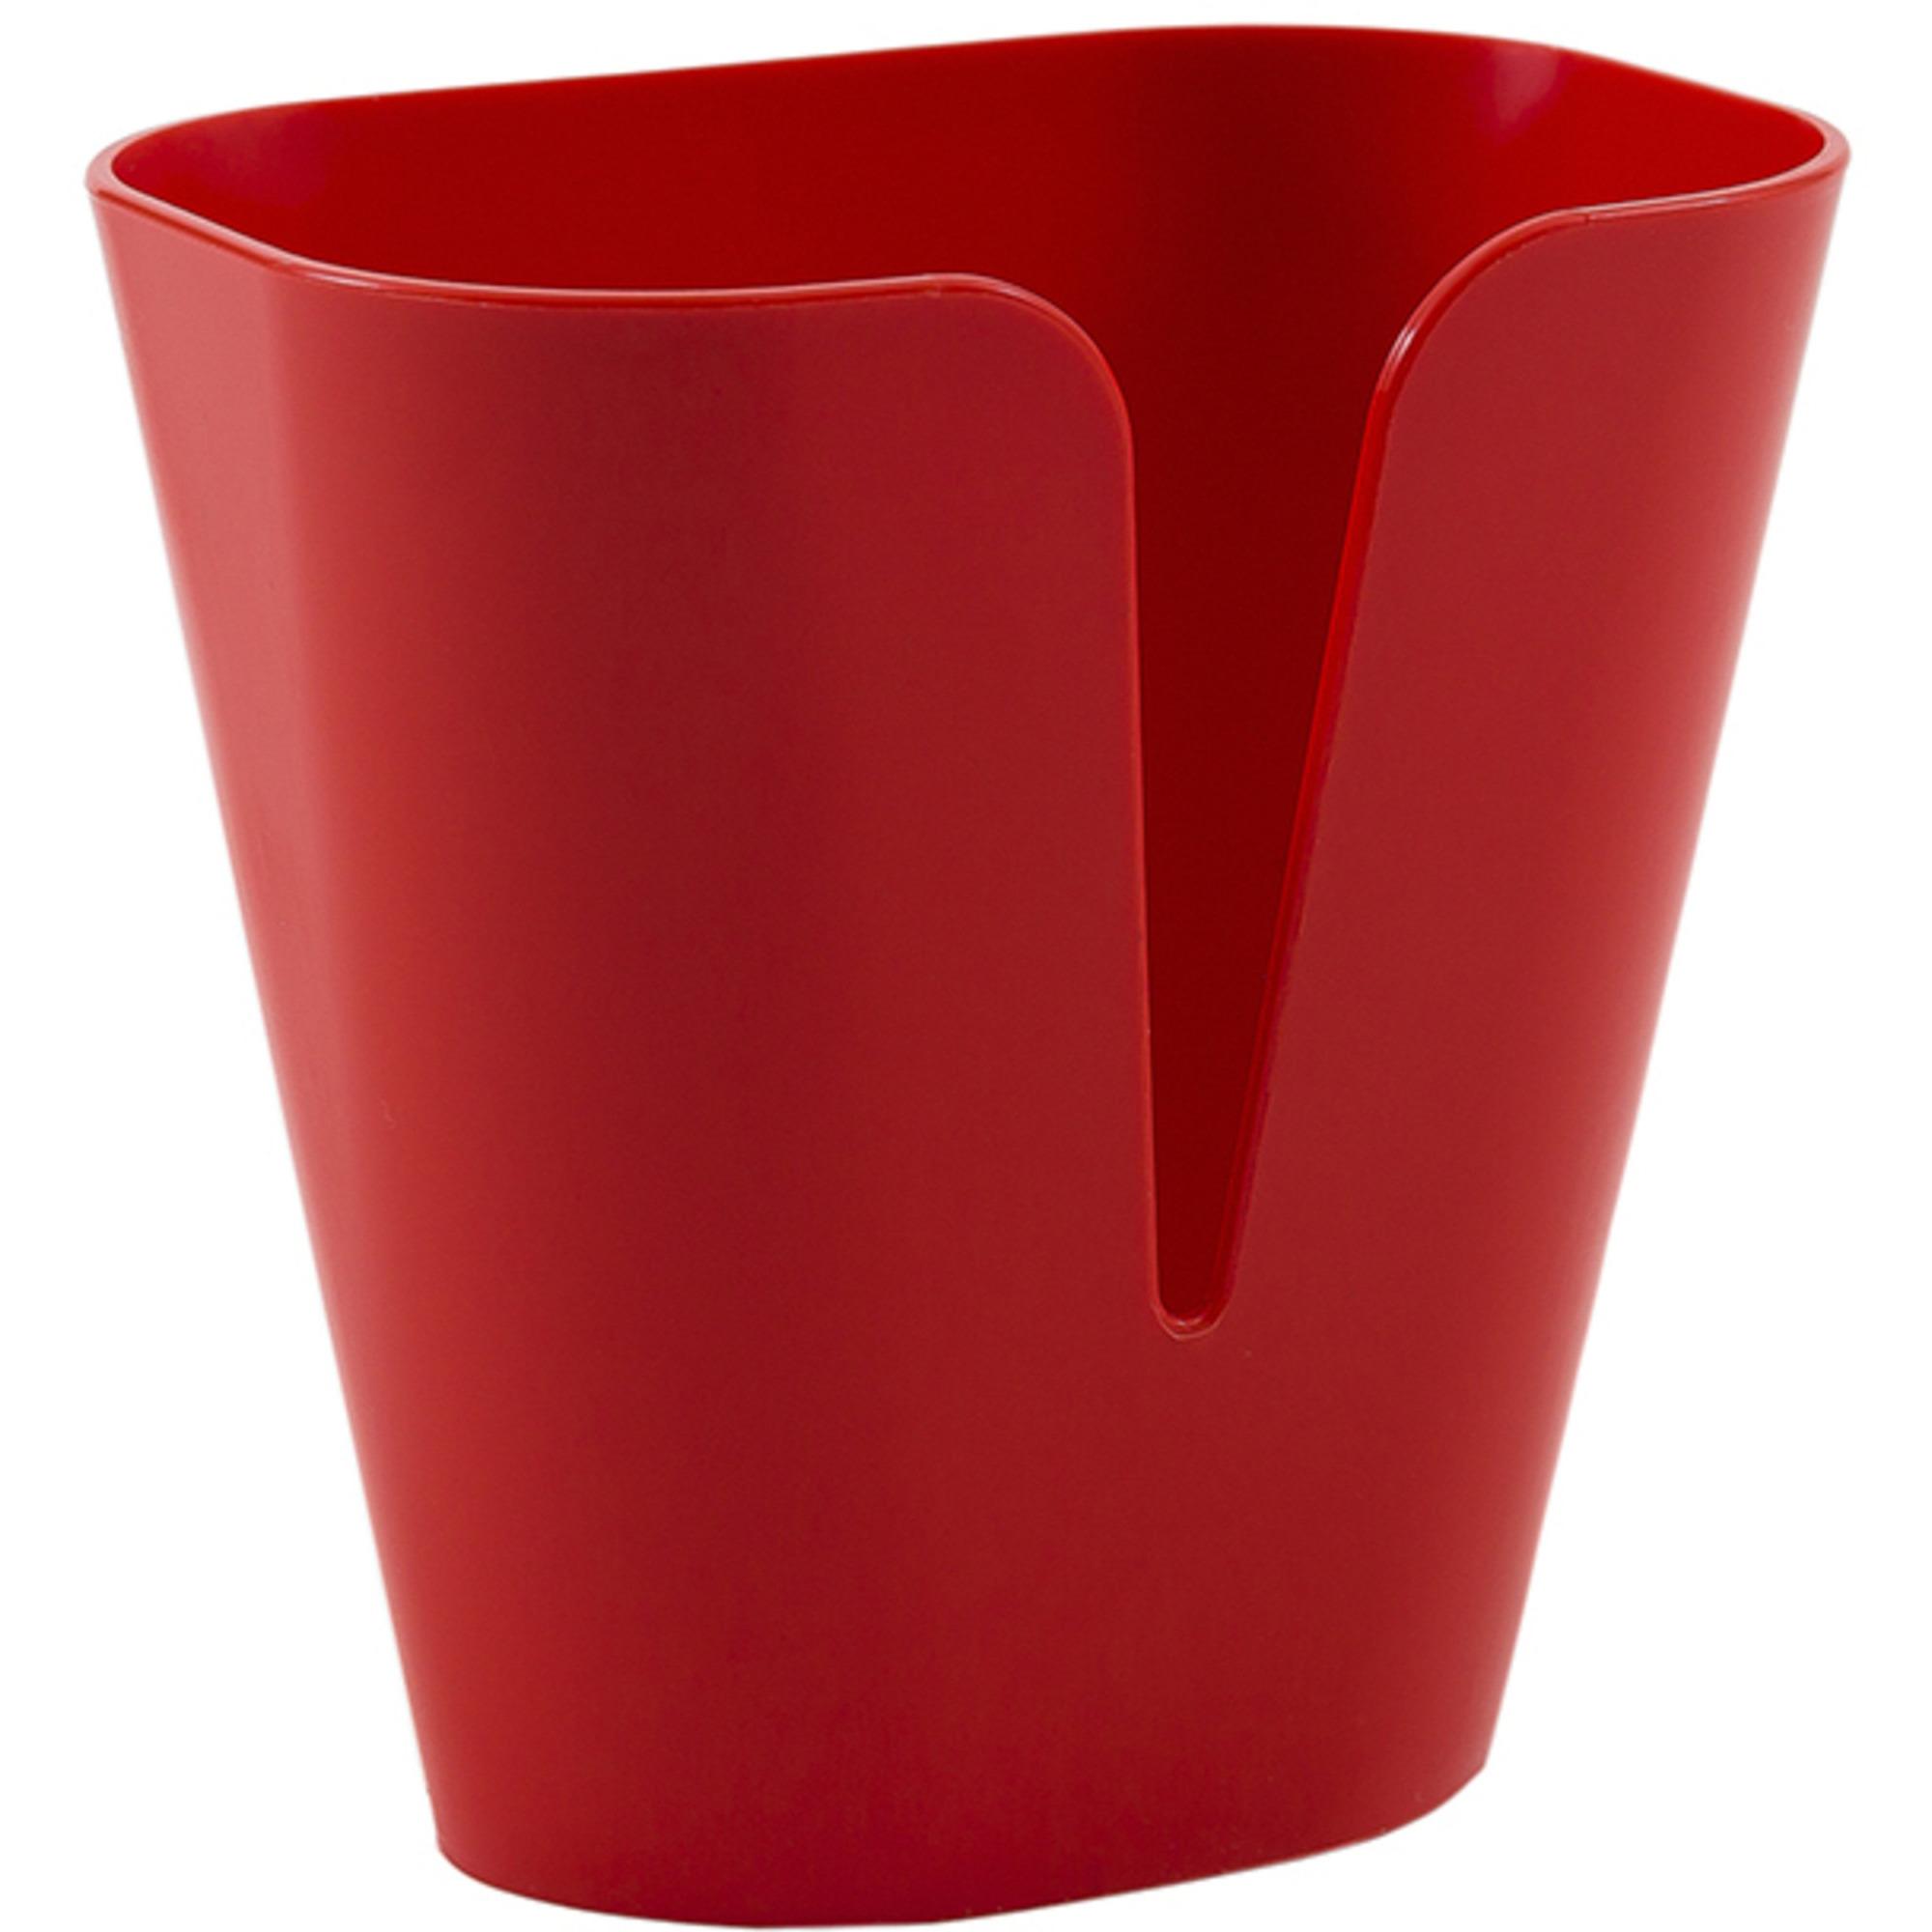 Dalolinden Wraphållare Röd Plast 4-pack